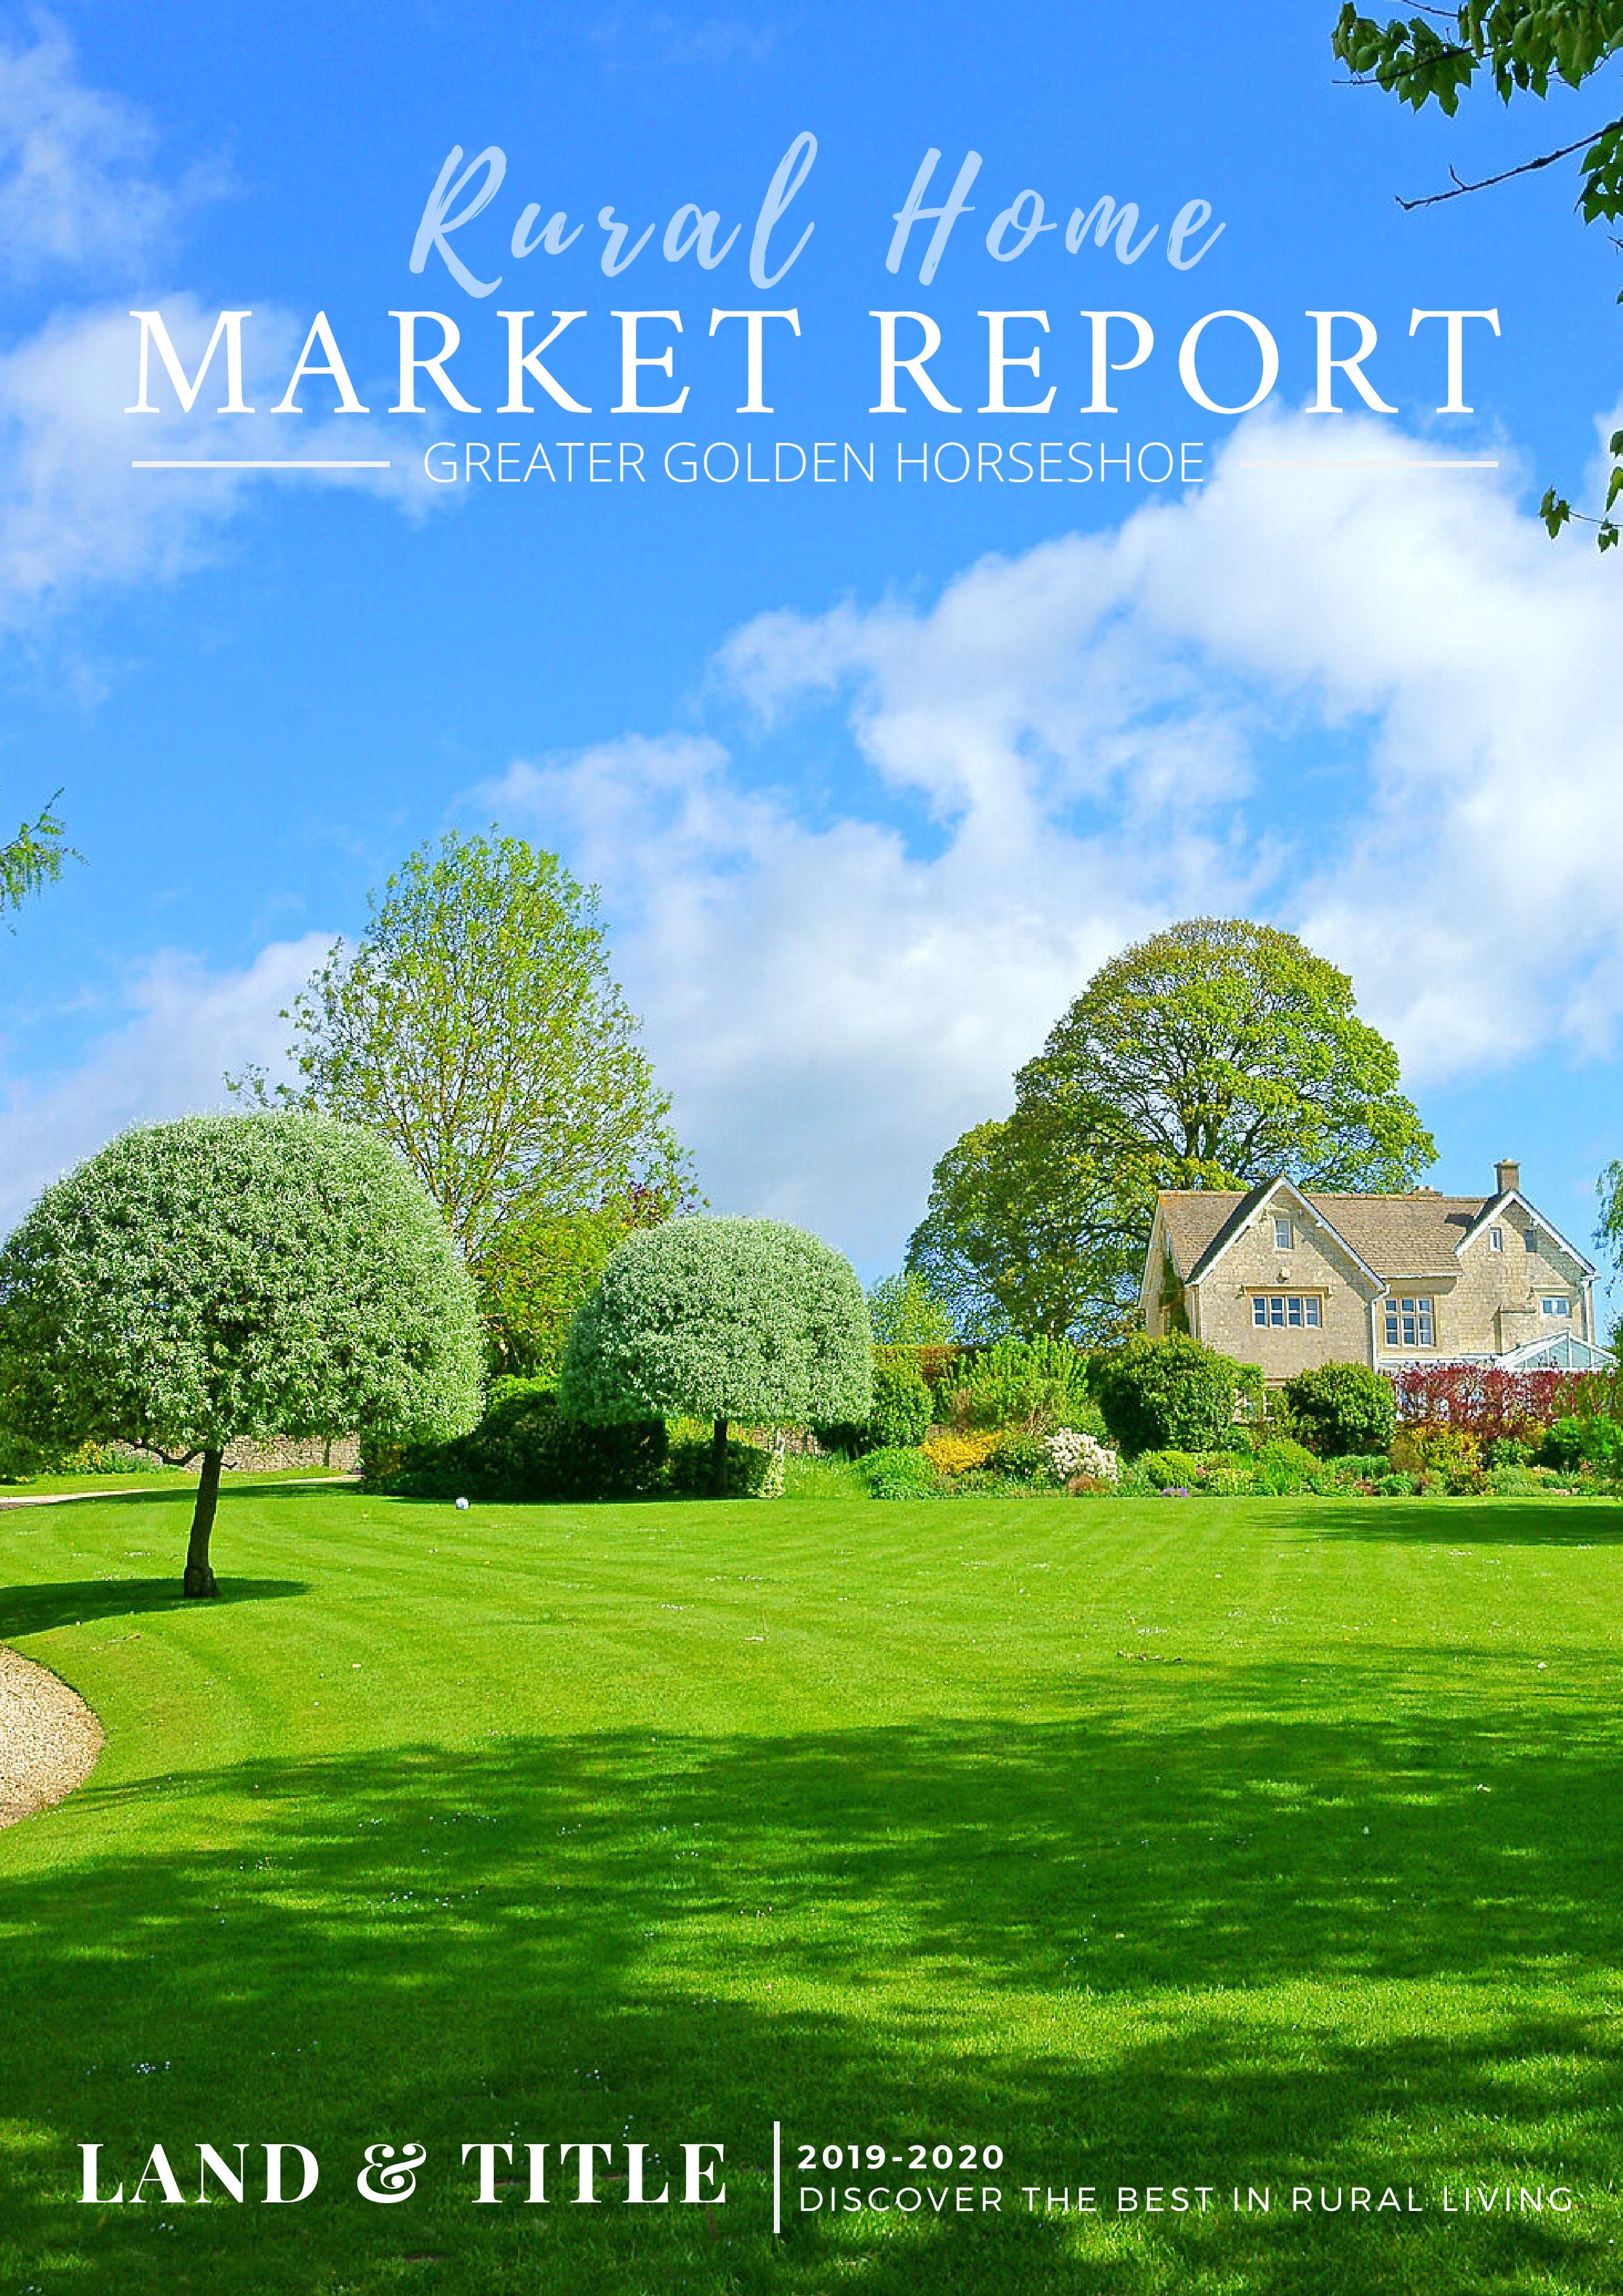 2019 Rural Home Market Report